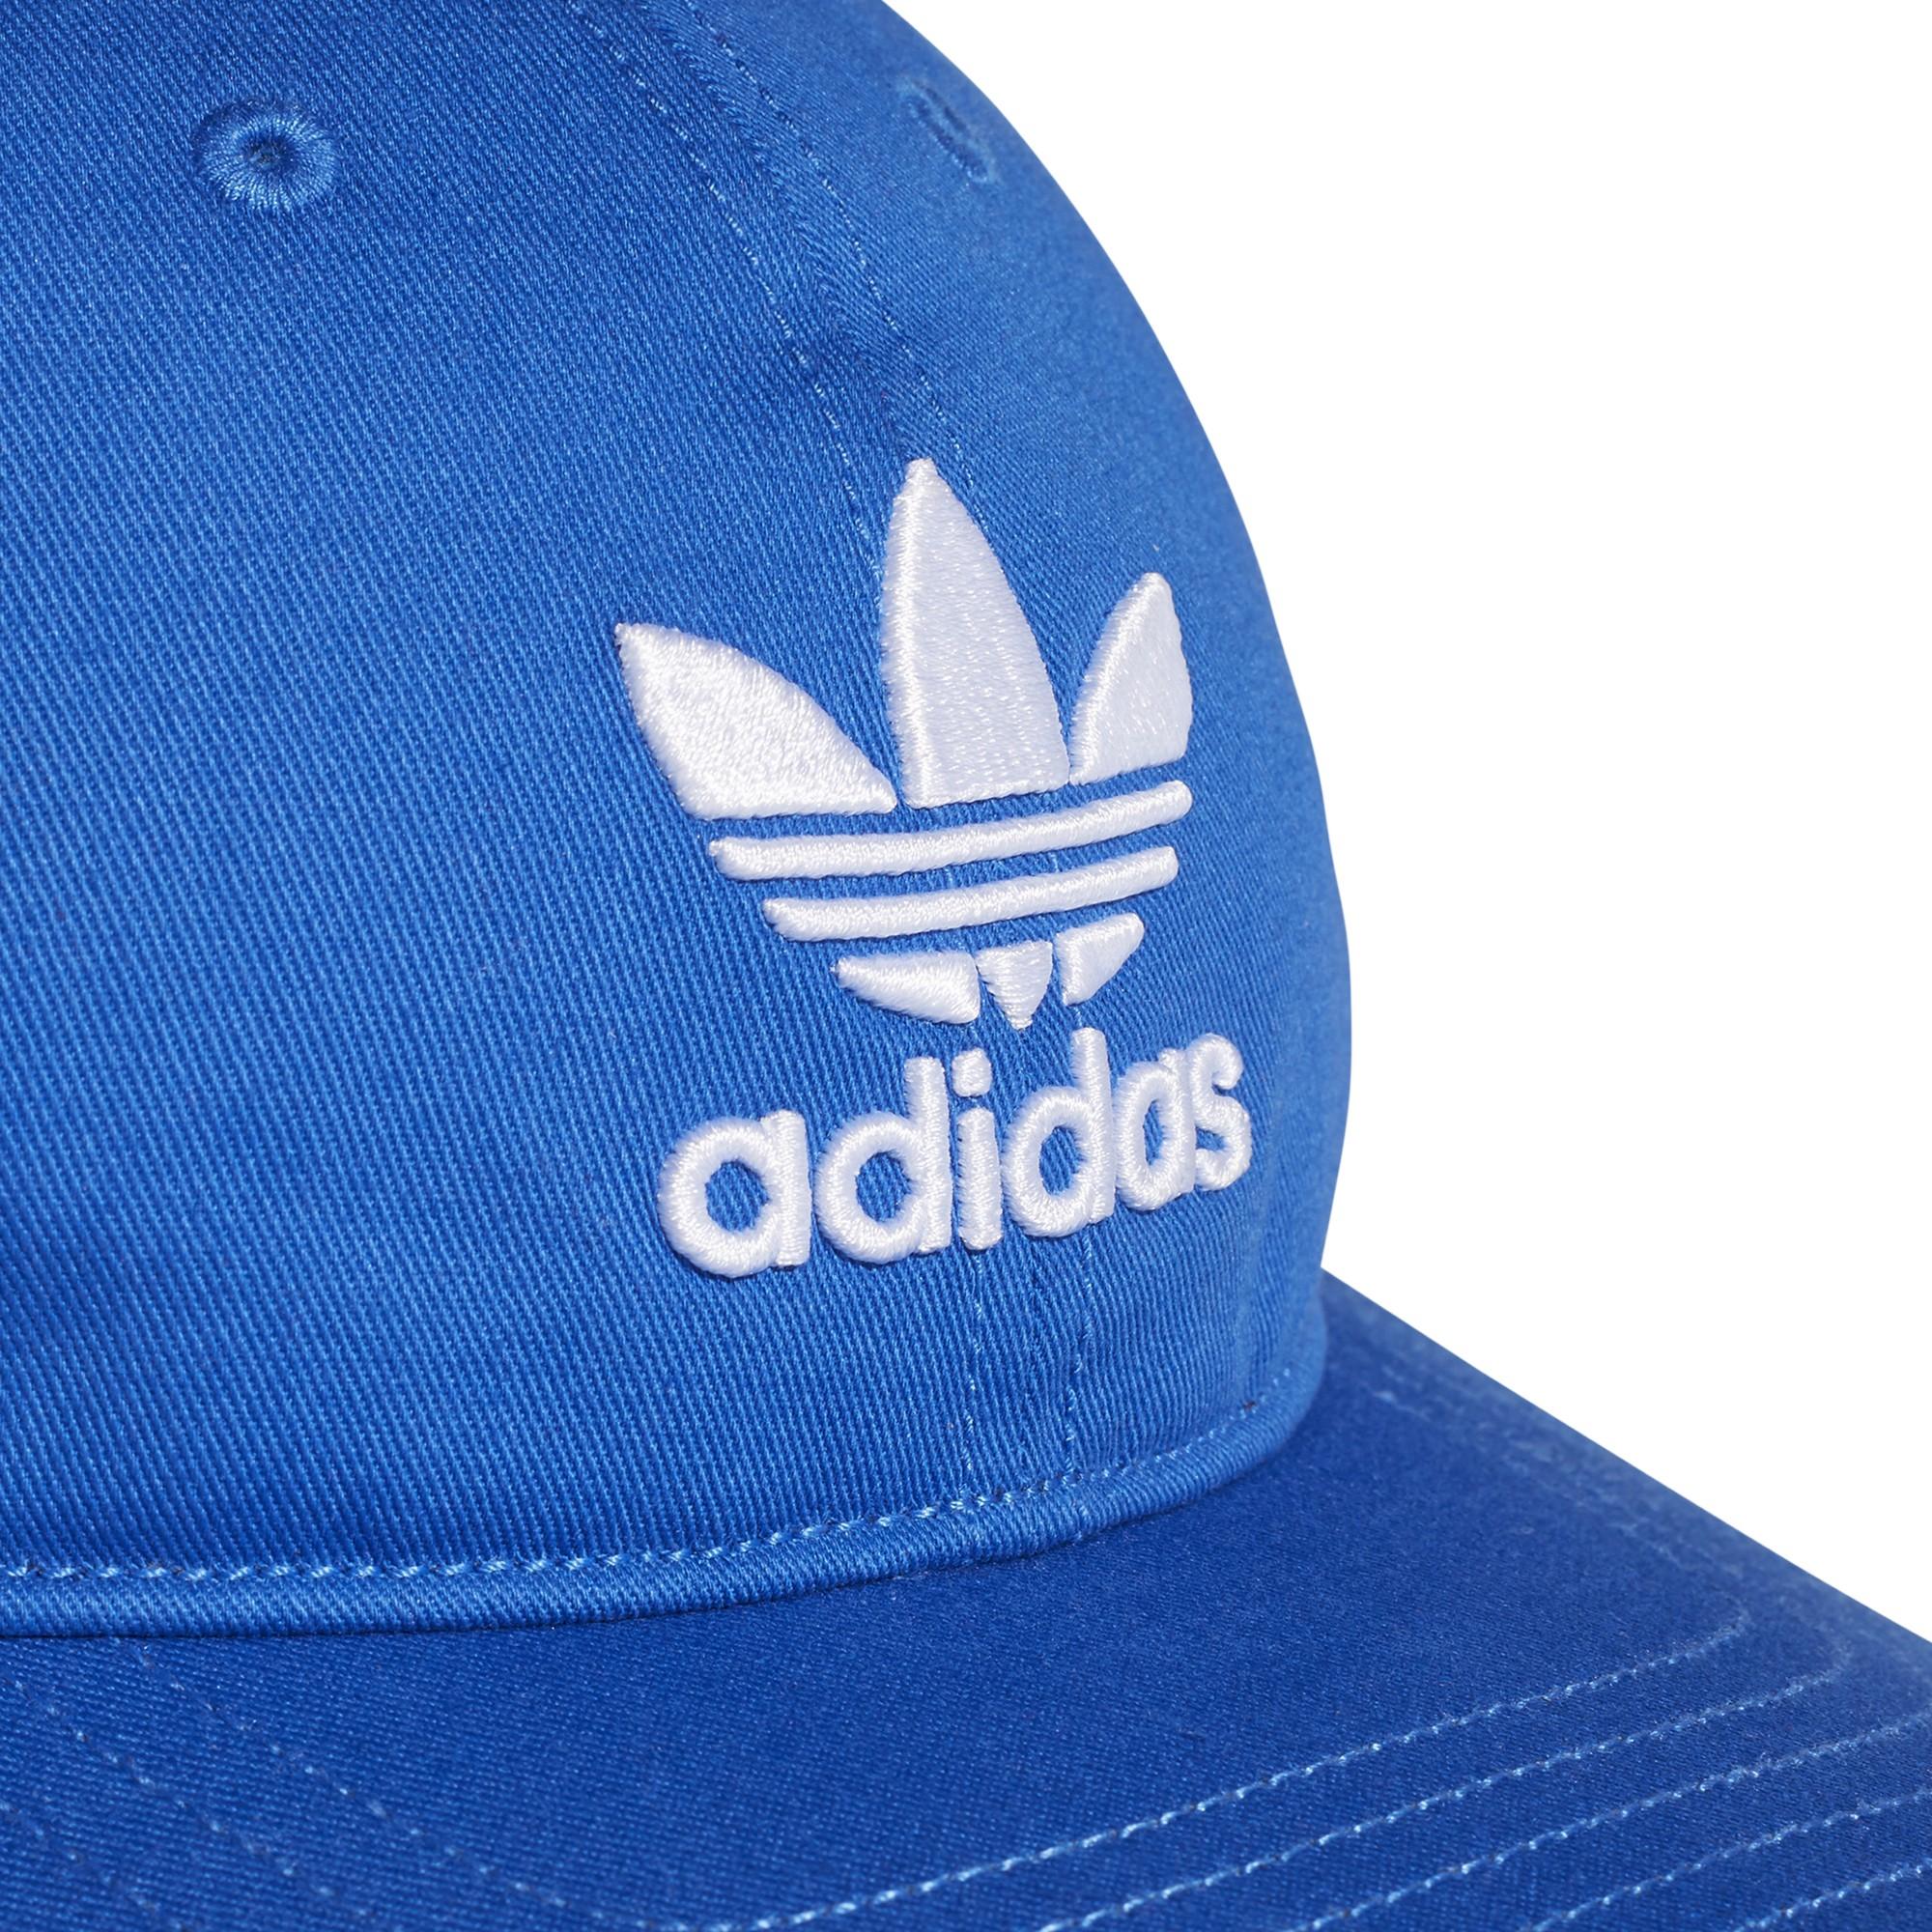 Venta de Gorra Adidas Trébol Azul Junior - Deportes Moya 4fe29ef54e9